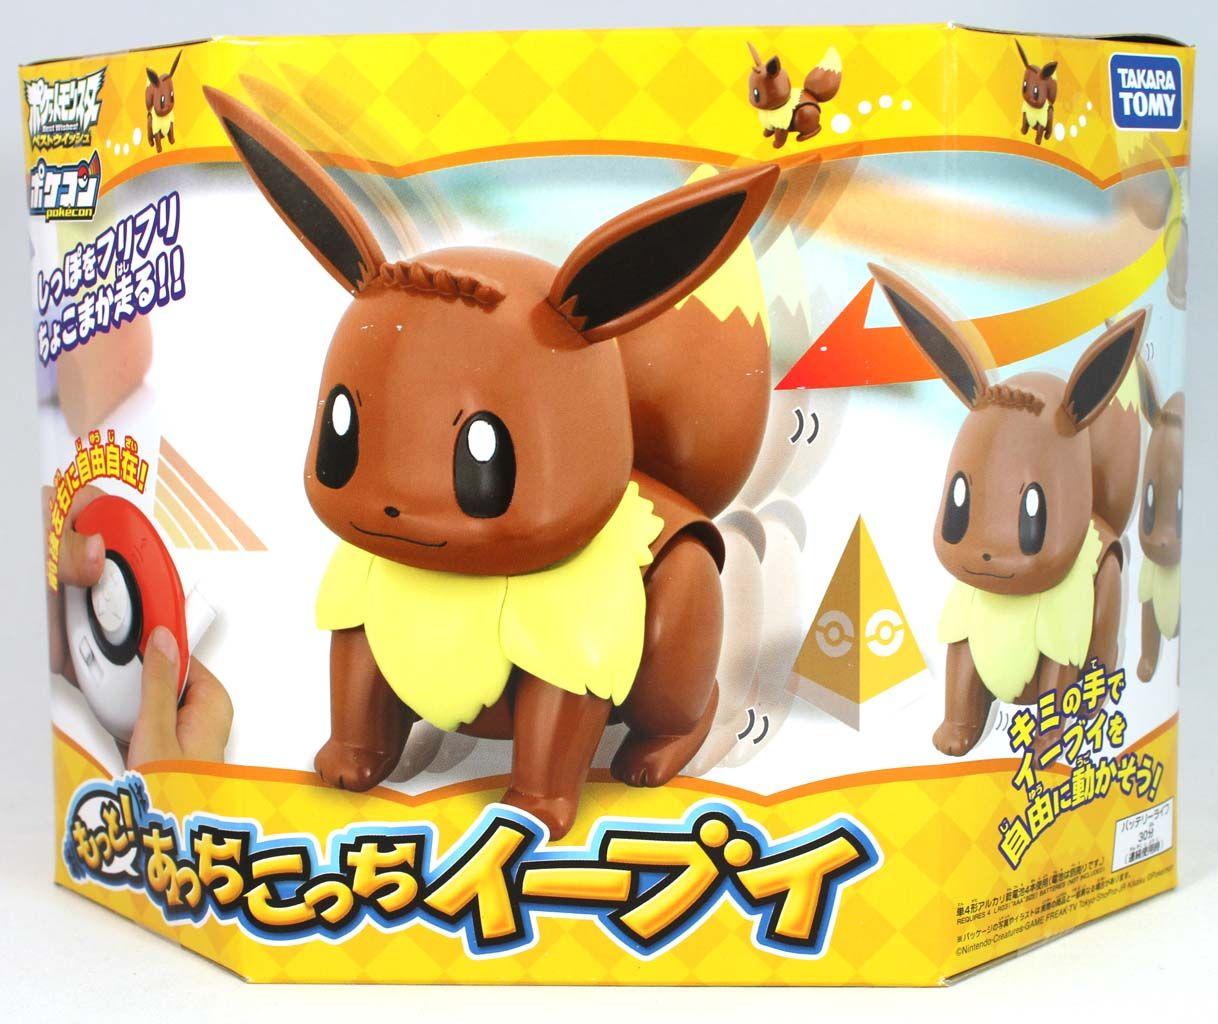 Remote controlled Eevee #Pokemon #Eevee